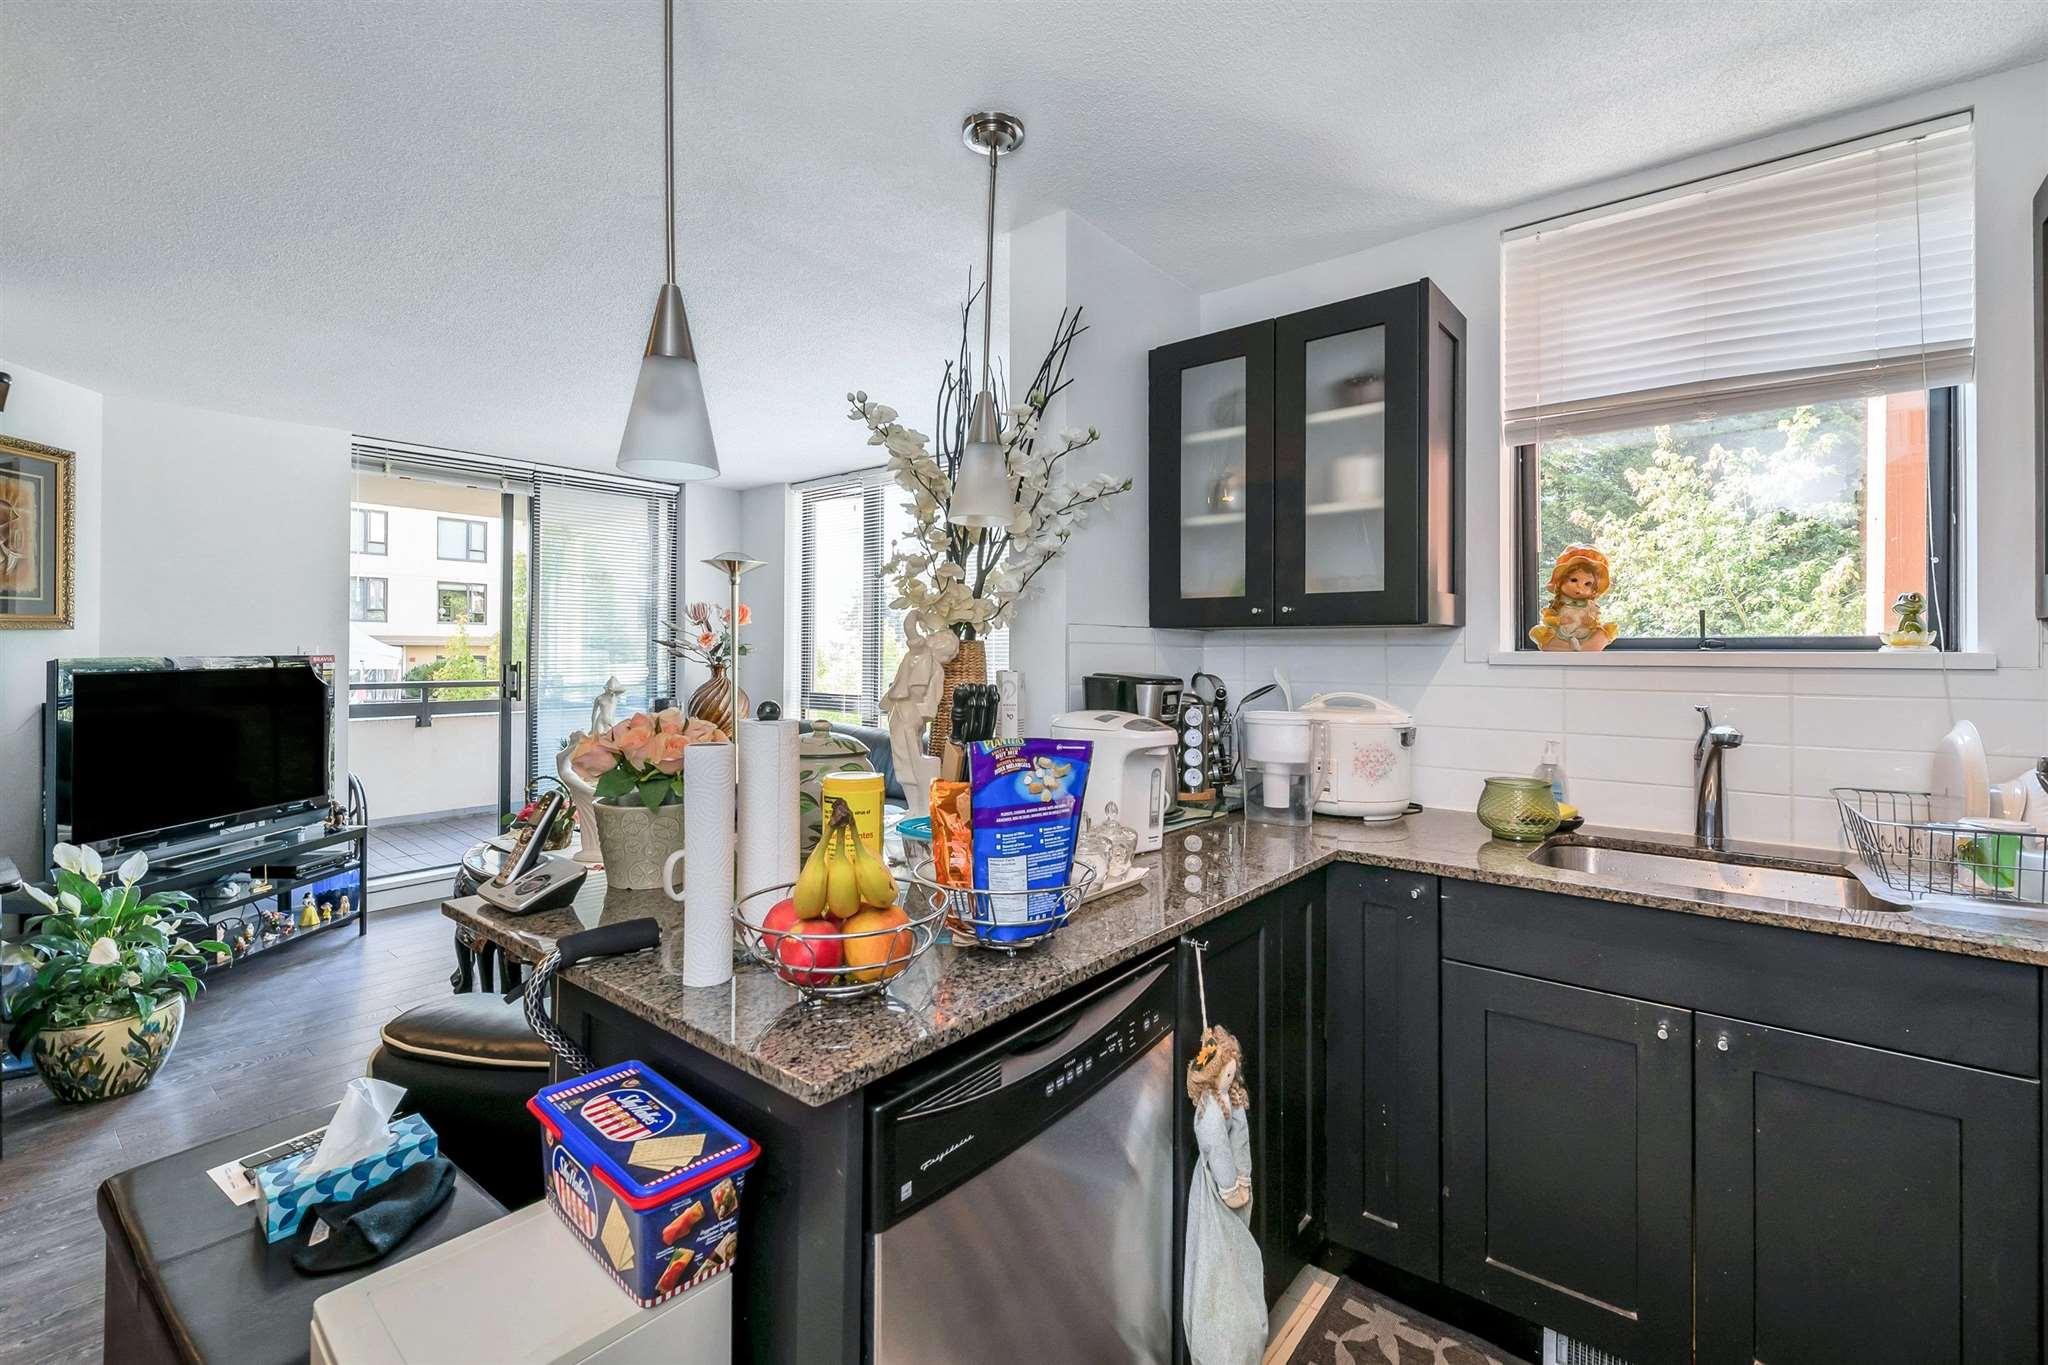 205 7225 ACORN AVENUE - Highgate Apartment/Condo for sale, 2 Bedrooms (R2606454) - #8